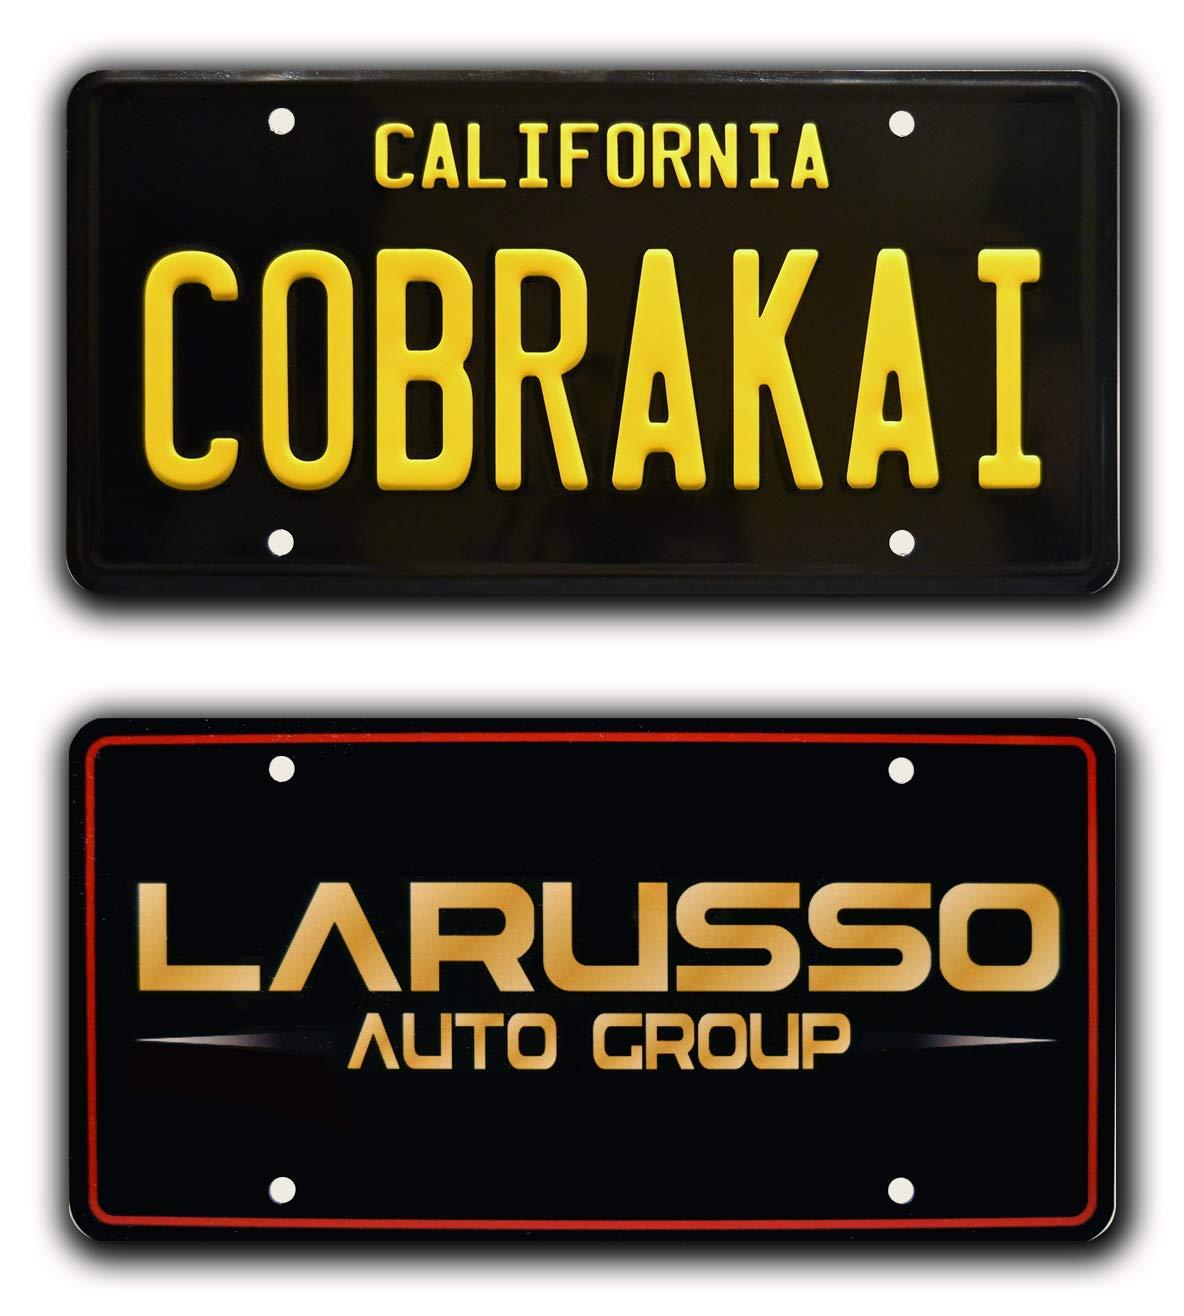 Celebrity Auto Group >> Celebrity Machines Cobrai Kai Larusso Auto Group Metal